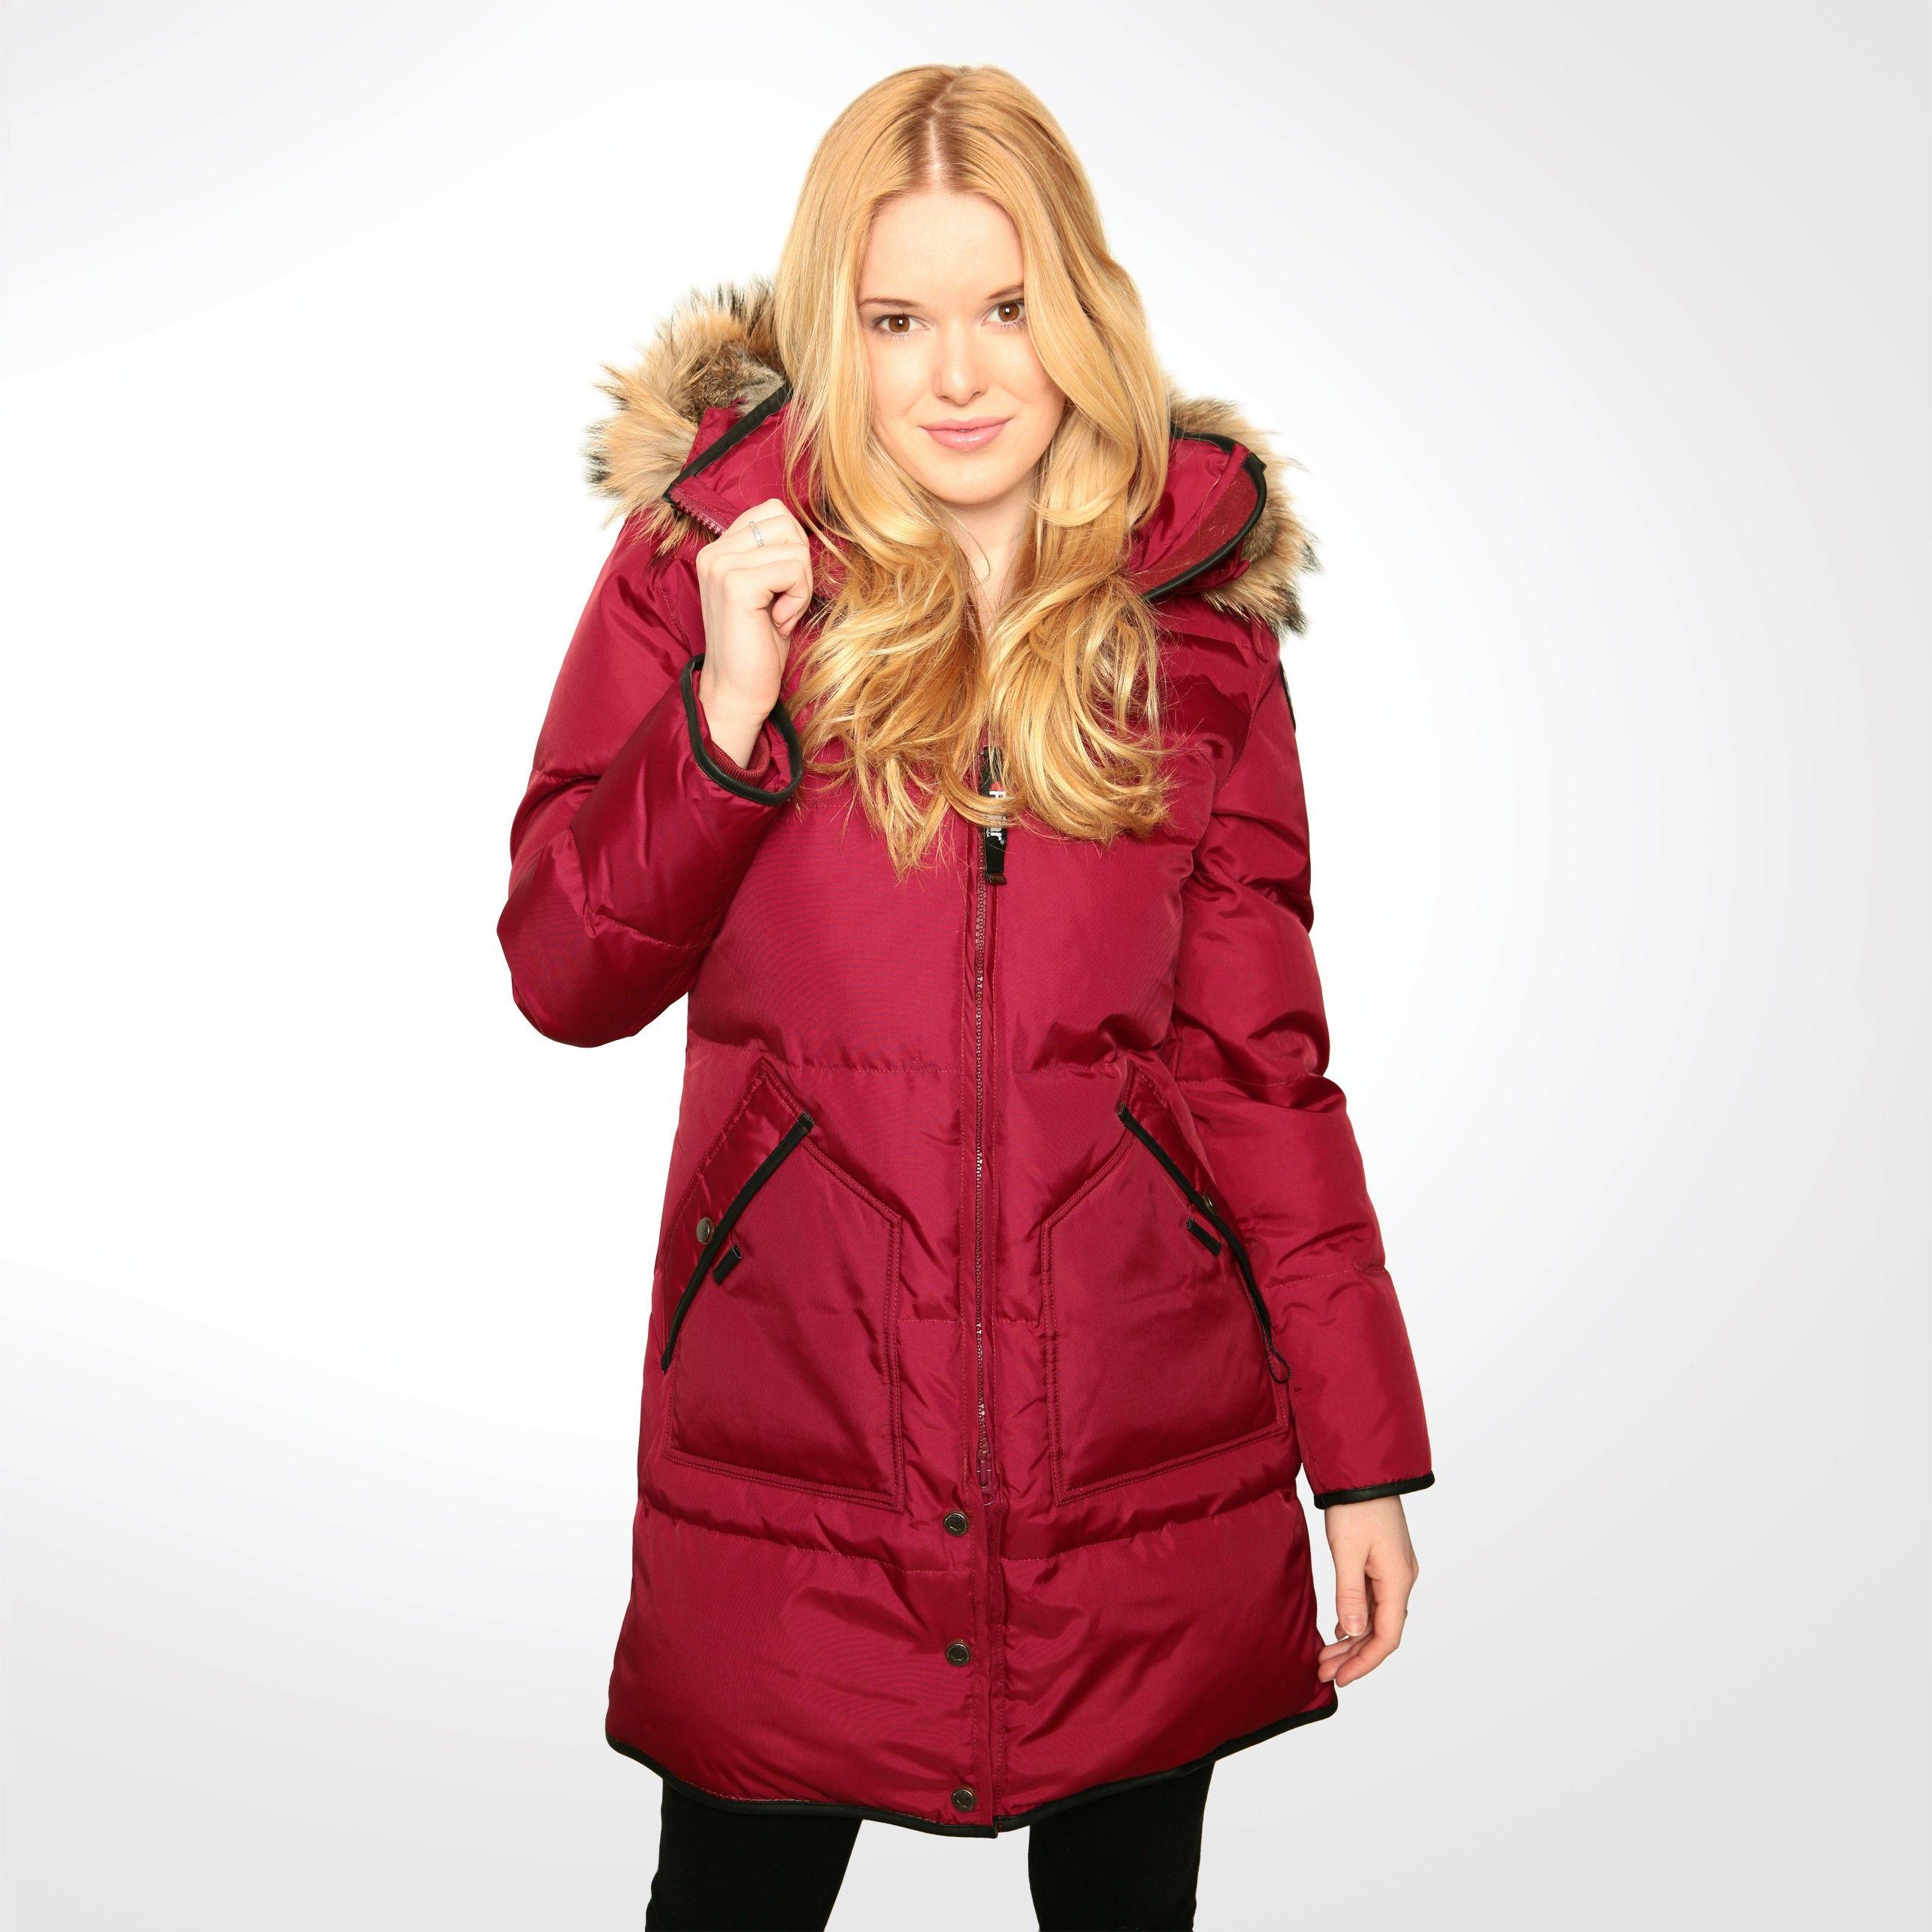 Cougar Red   Pajar USA   winter fashion   Pinterest   Winter ...